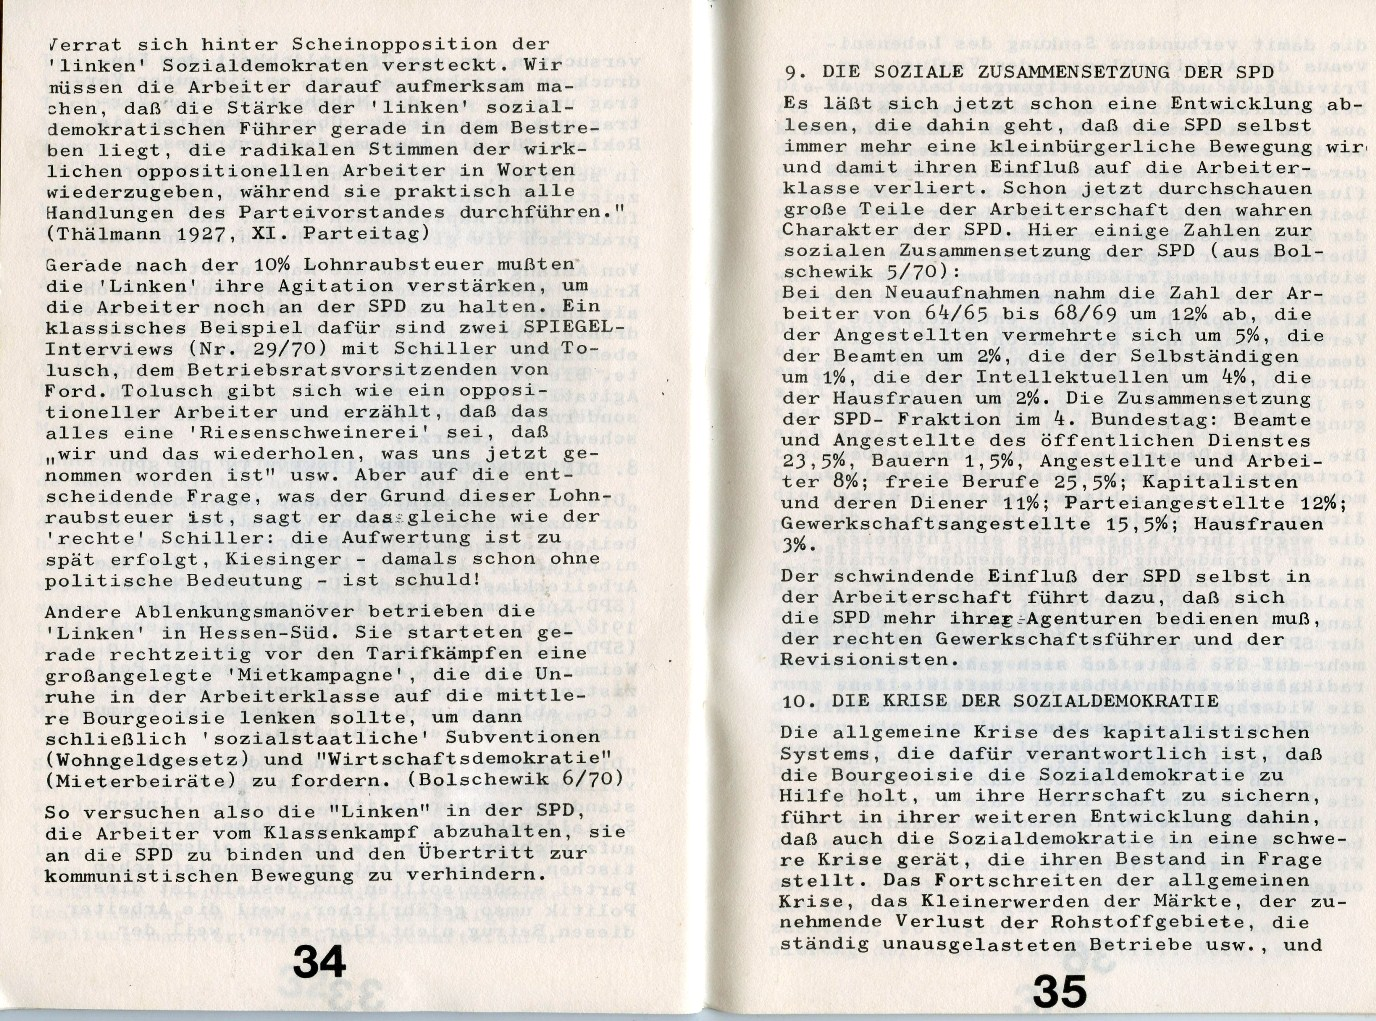 KJVD_Sozialdemokratie_Sozialfaschismus_1971_19